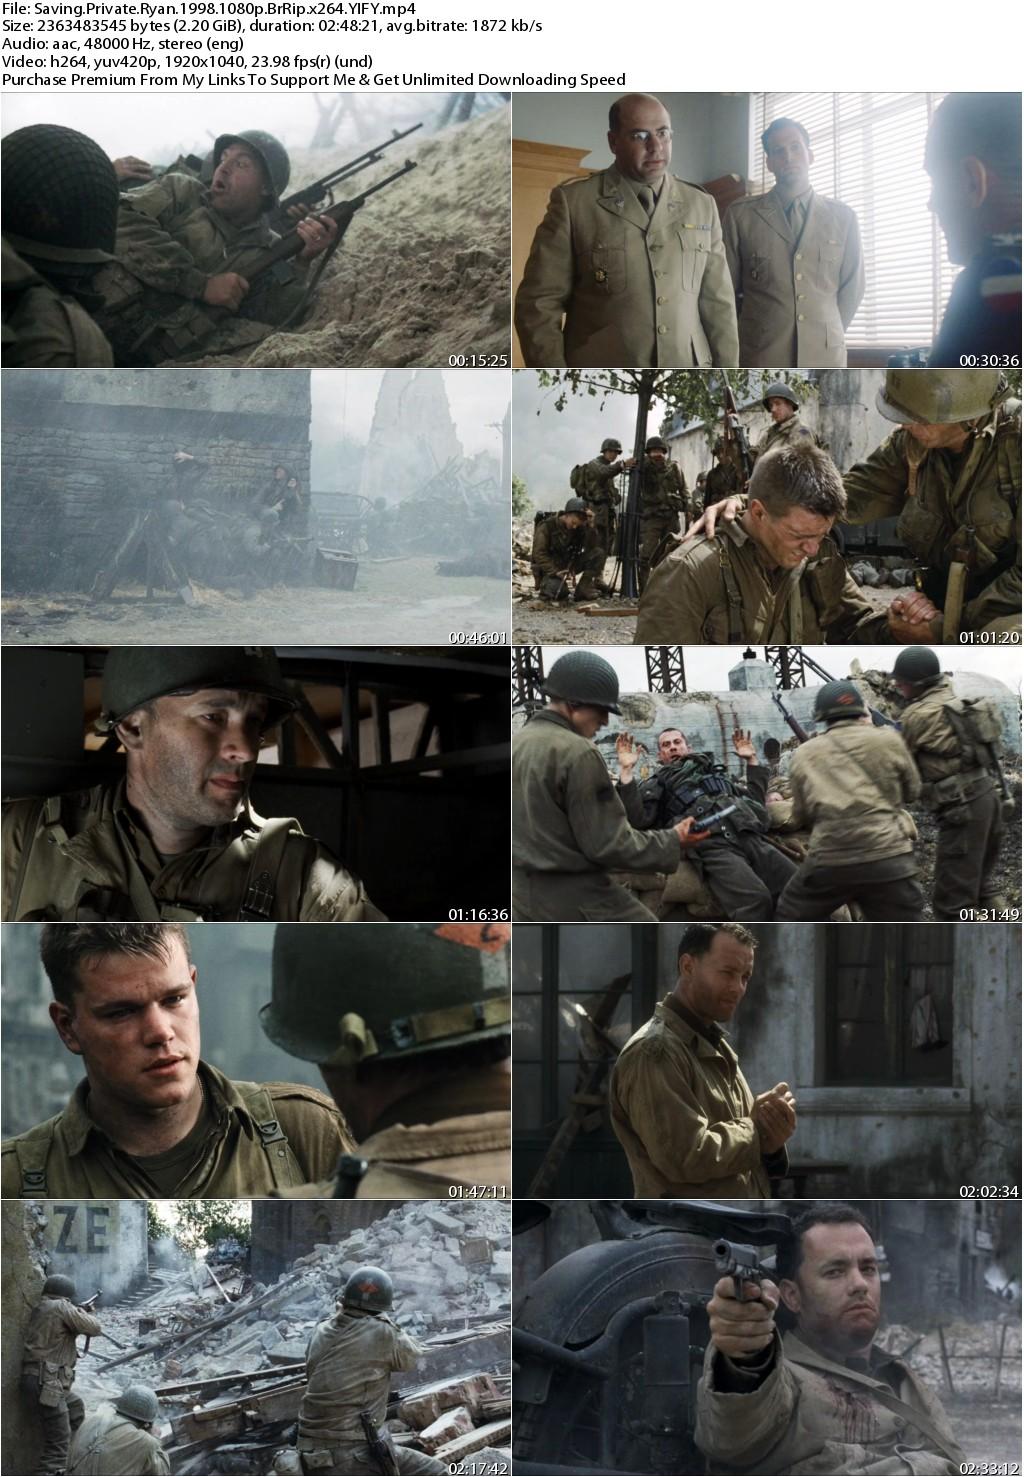 Saving Private Ryan (1998) 1080p BrRip x264 YIFY